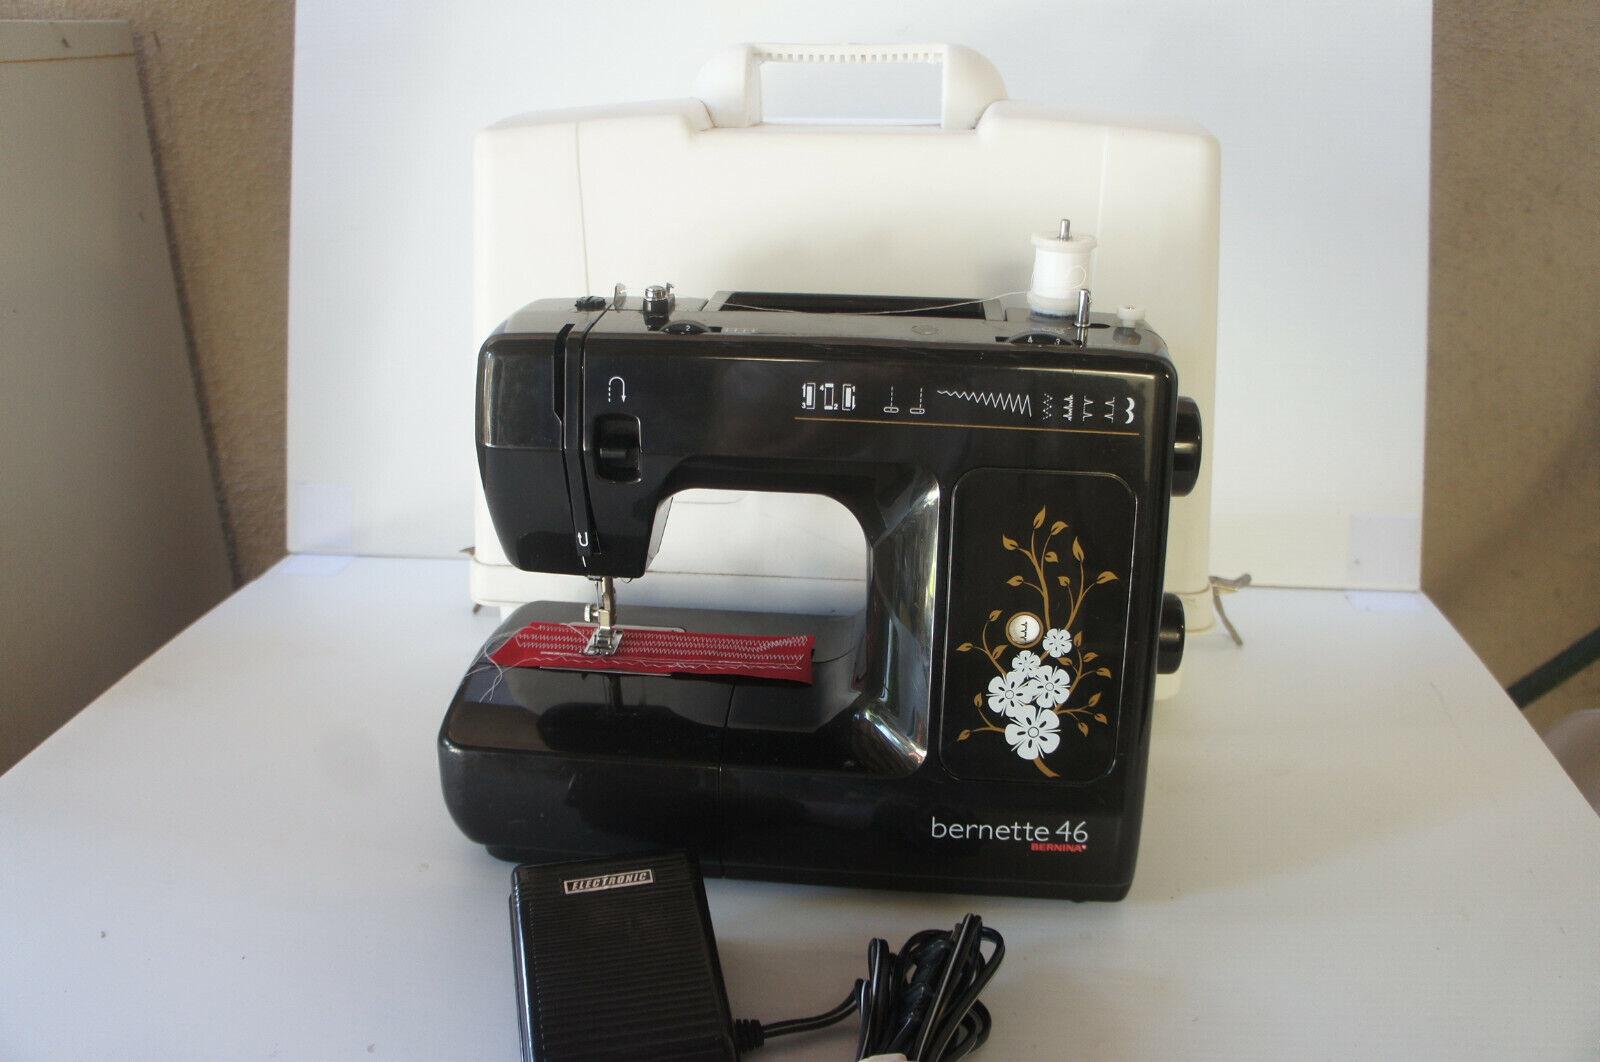 s l1600 - 🍀  FULLY SERVICED! Bernina Bernette 46 Sewing Machine w Pedal Case EXTRAS!